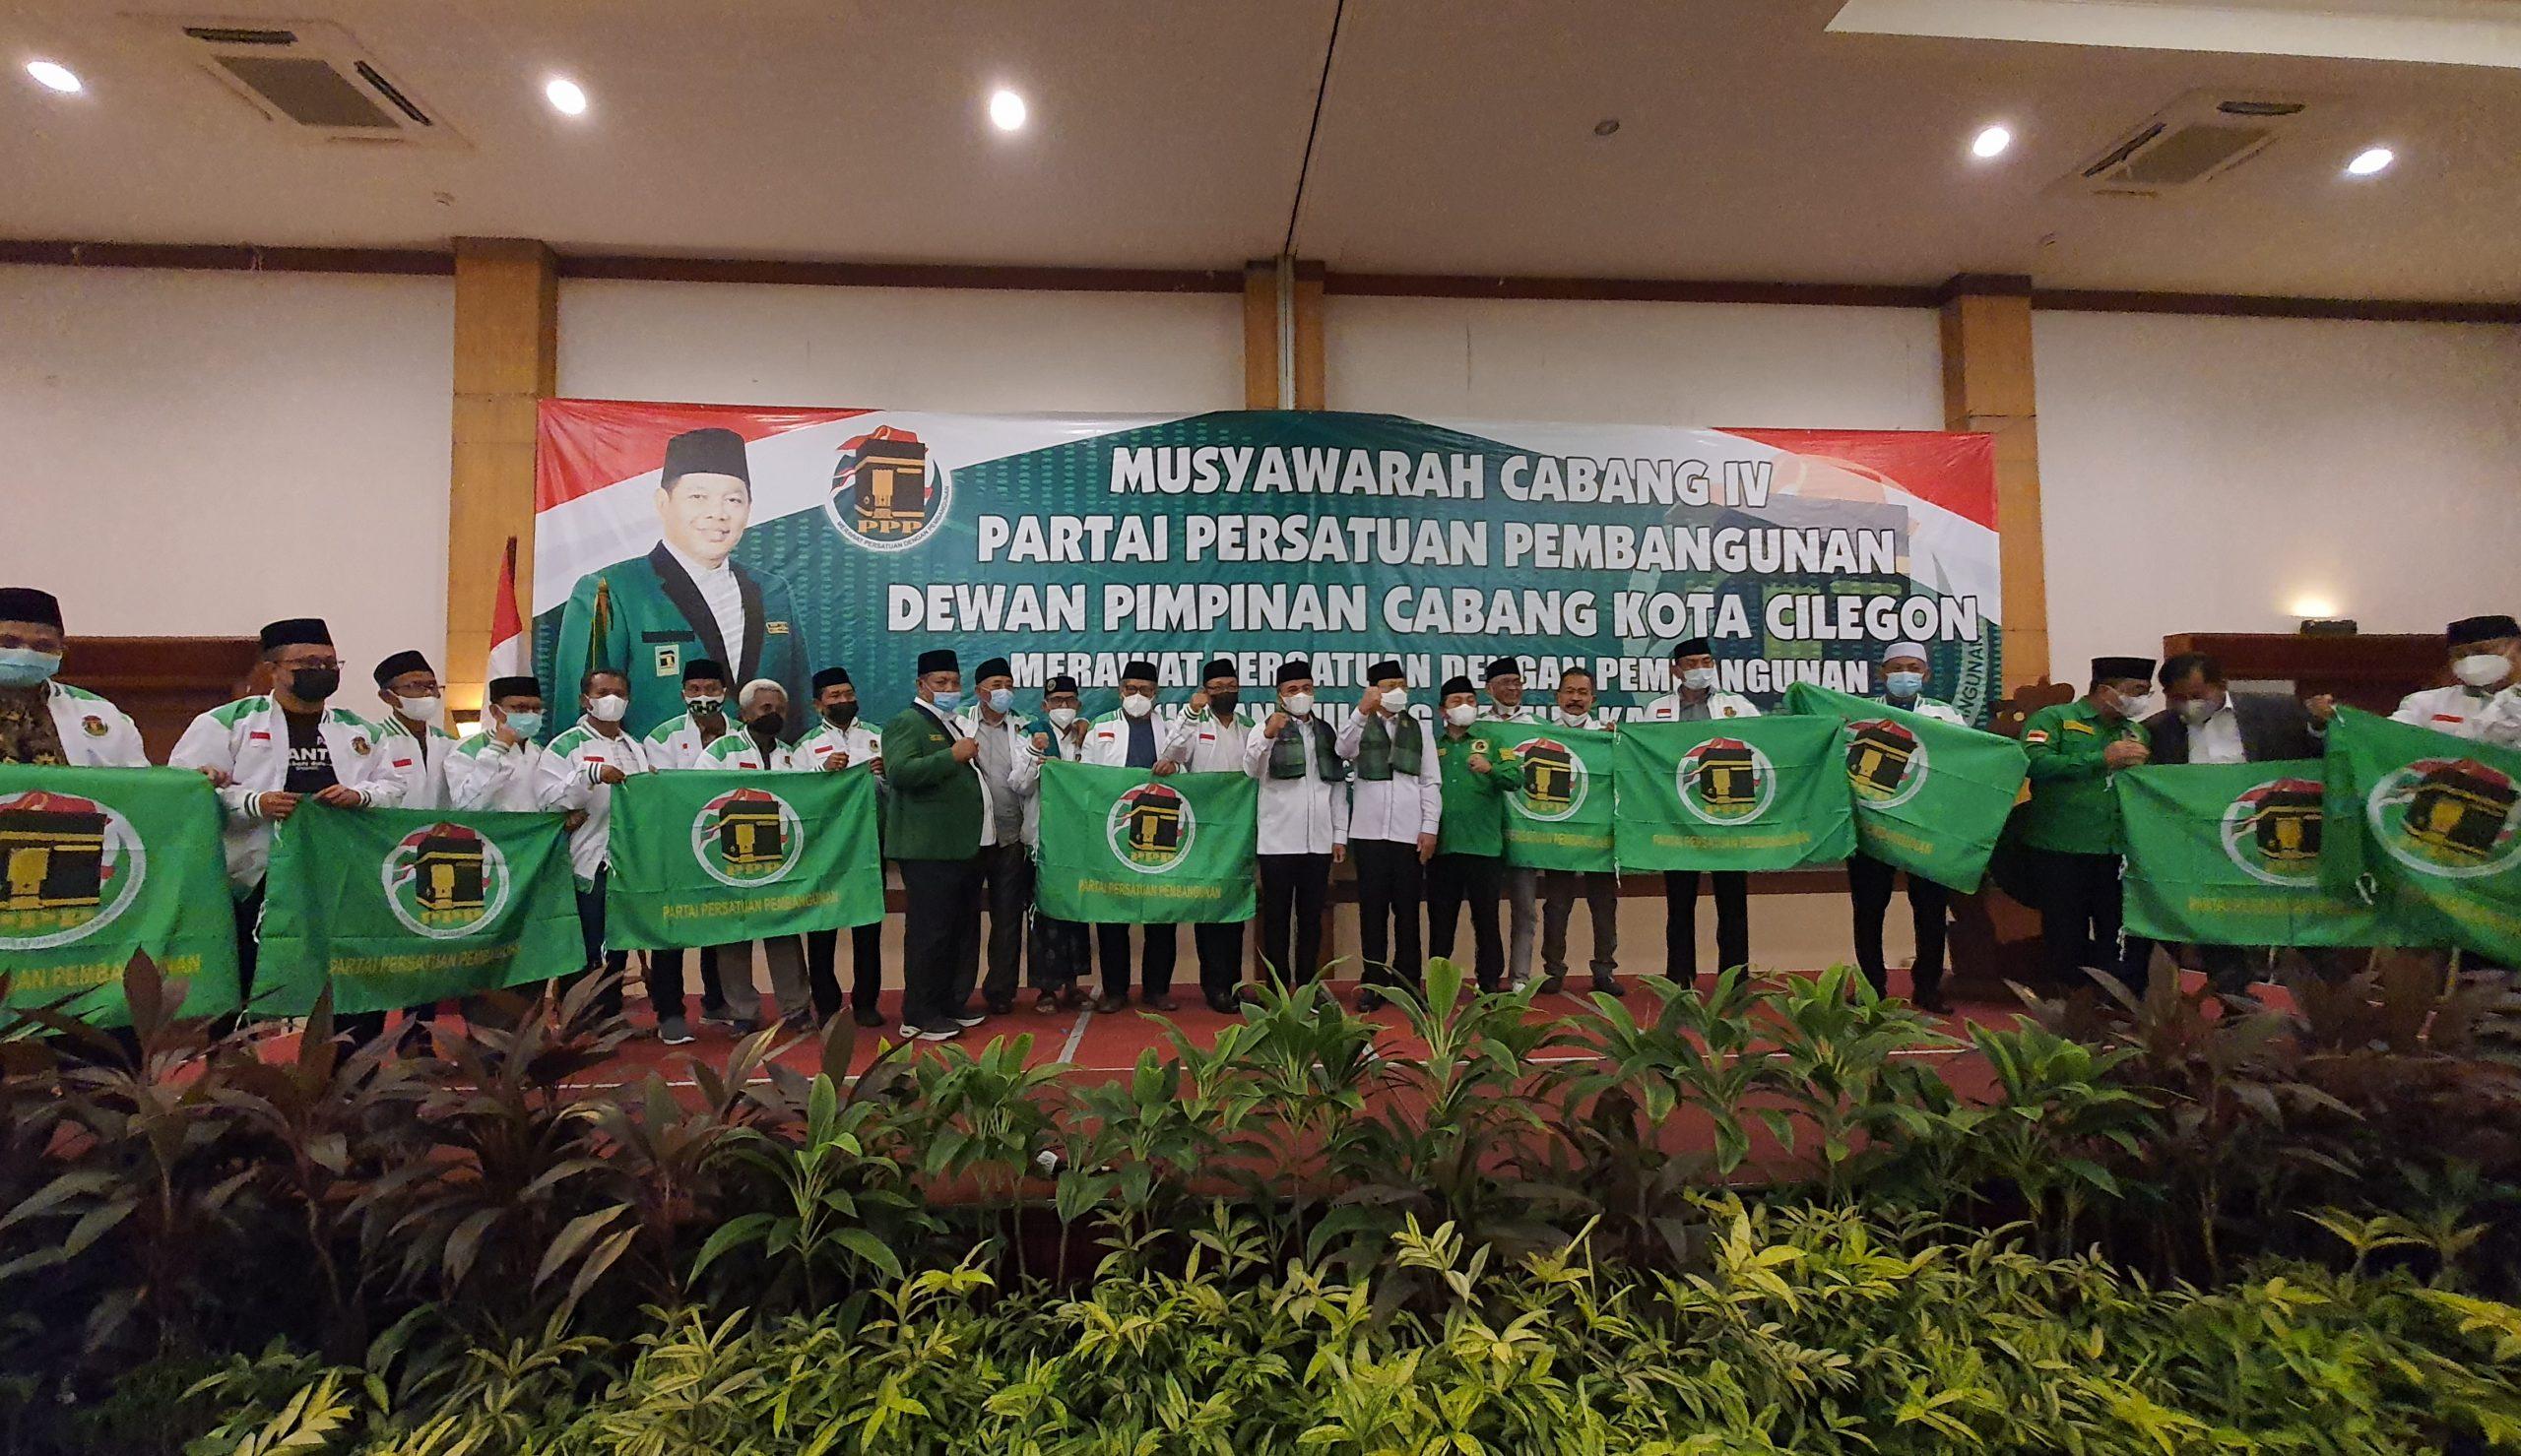 Siap-siap! PPP Akan 'Menggila' Lagi; di Jakarta Haji Lulung Come Back, di Banten Petinggi Golkar Jadi Ketua DPC Cilegon